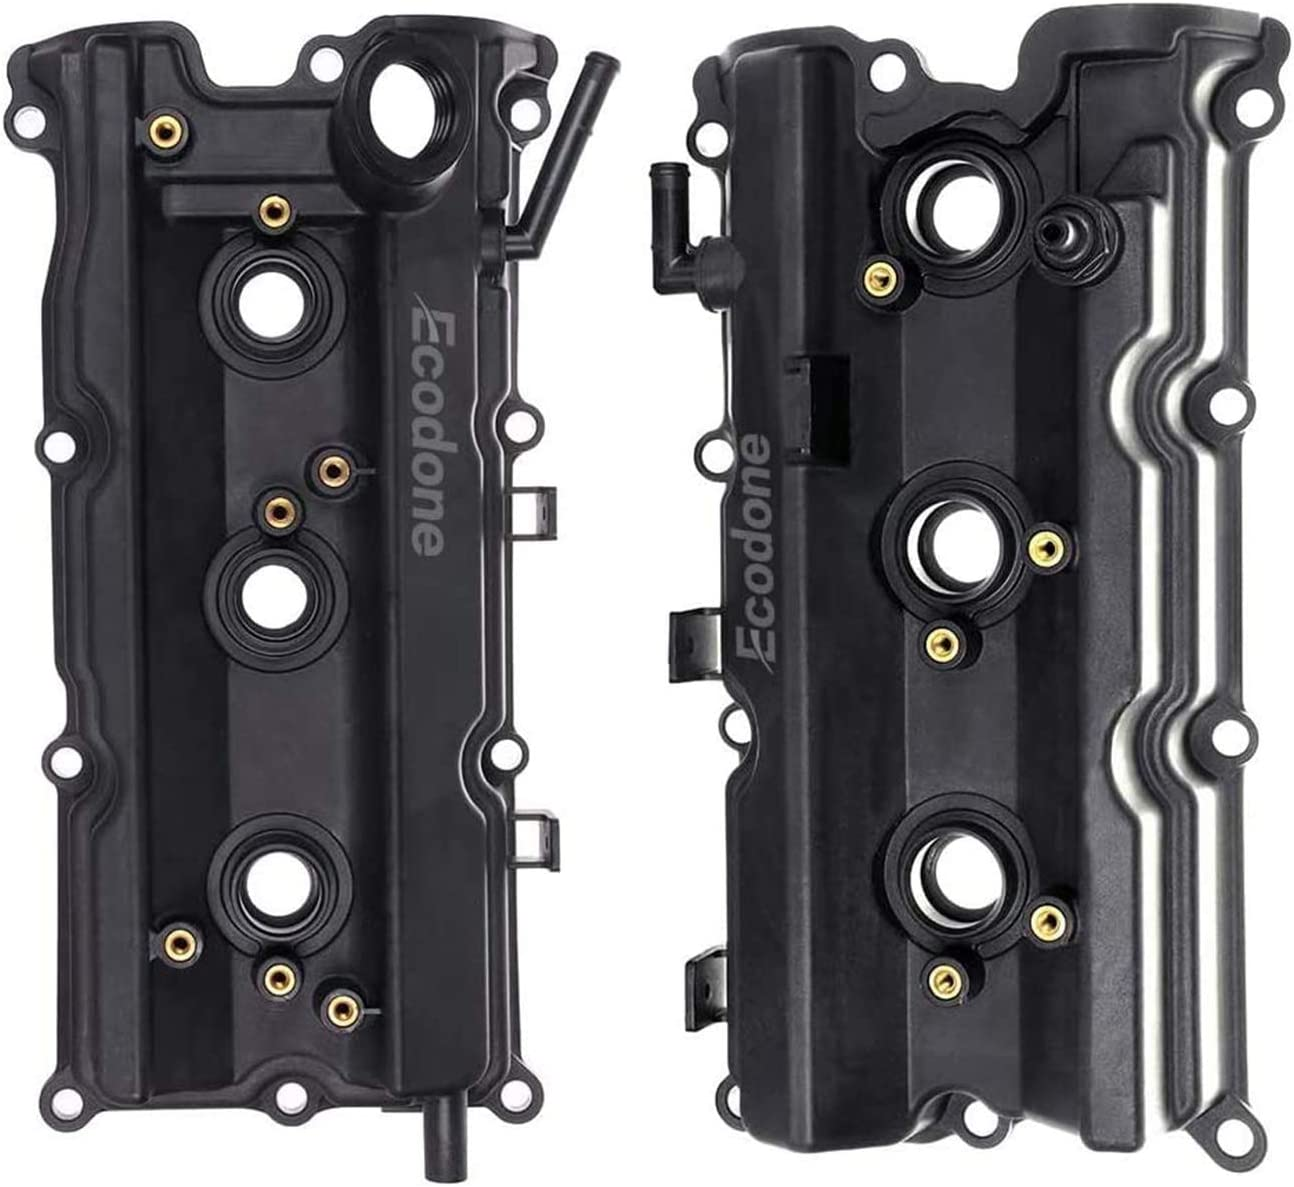 03-08 Infiniti FX35 Infiniti Engine Valve Covers Left /& Right For 03-06 Nissan Infiniti 350Z 03-06 Infiniti G35 06-08 Infiniti M35,VQ35DE V6 Motor 3.5L